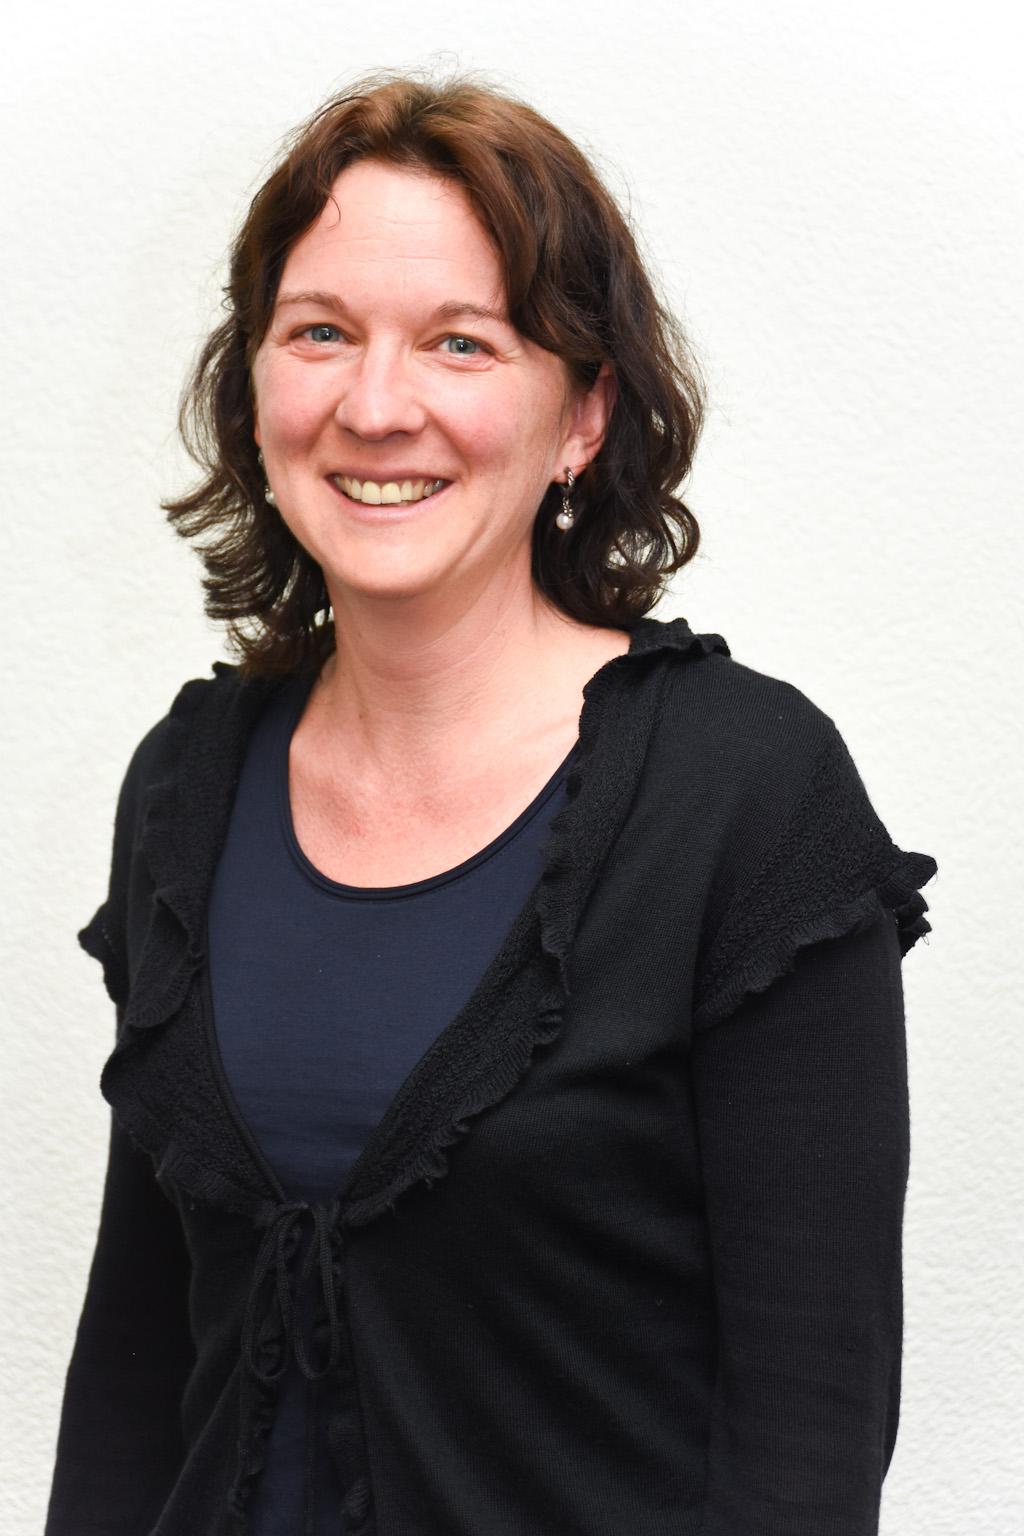 Julia Ruckstuhl